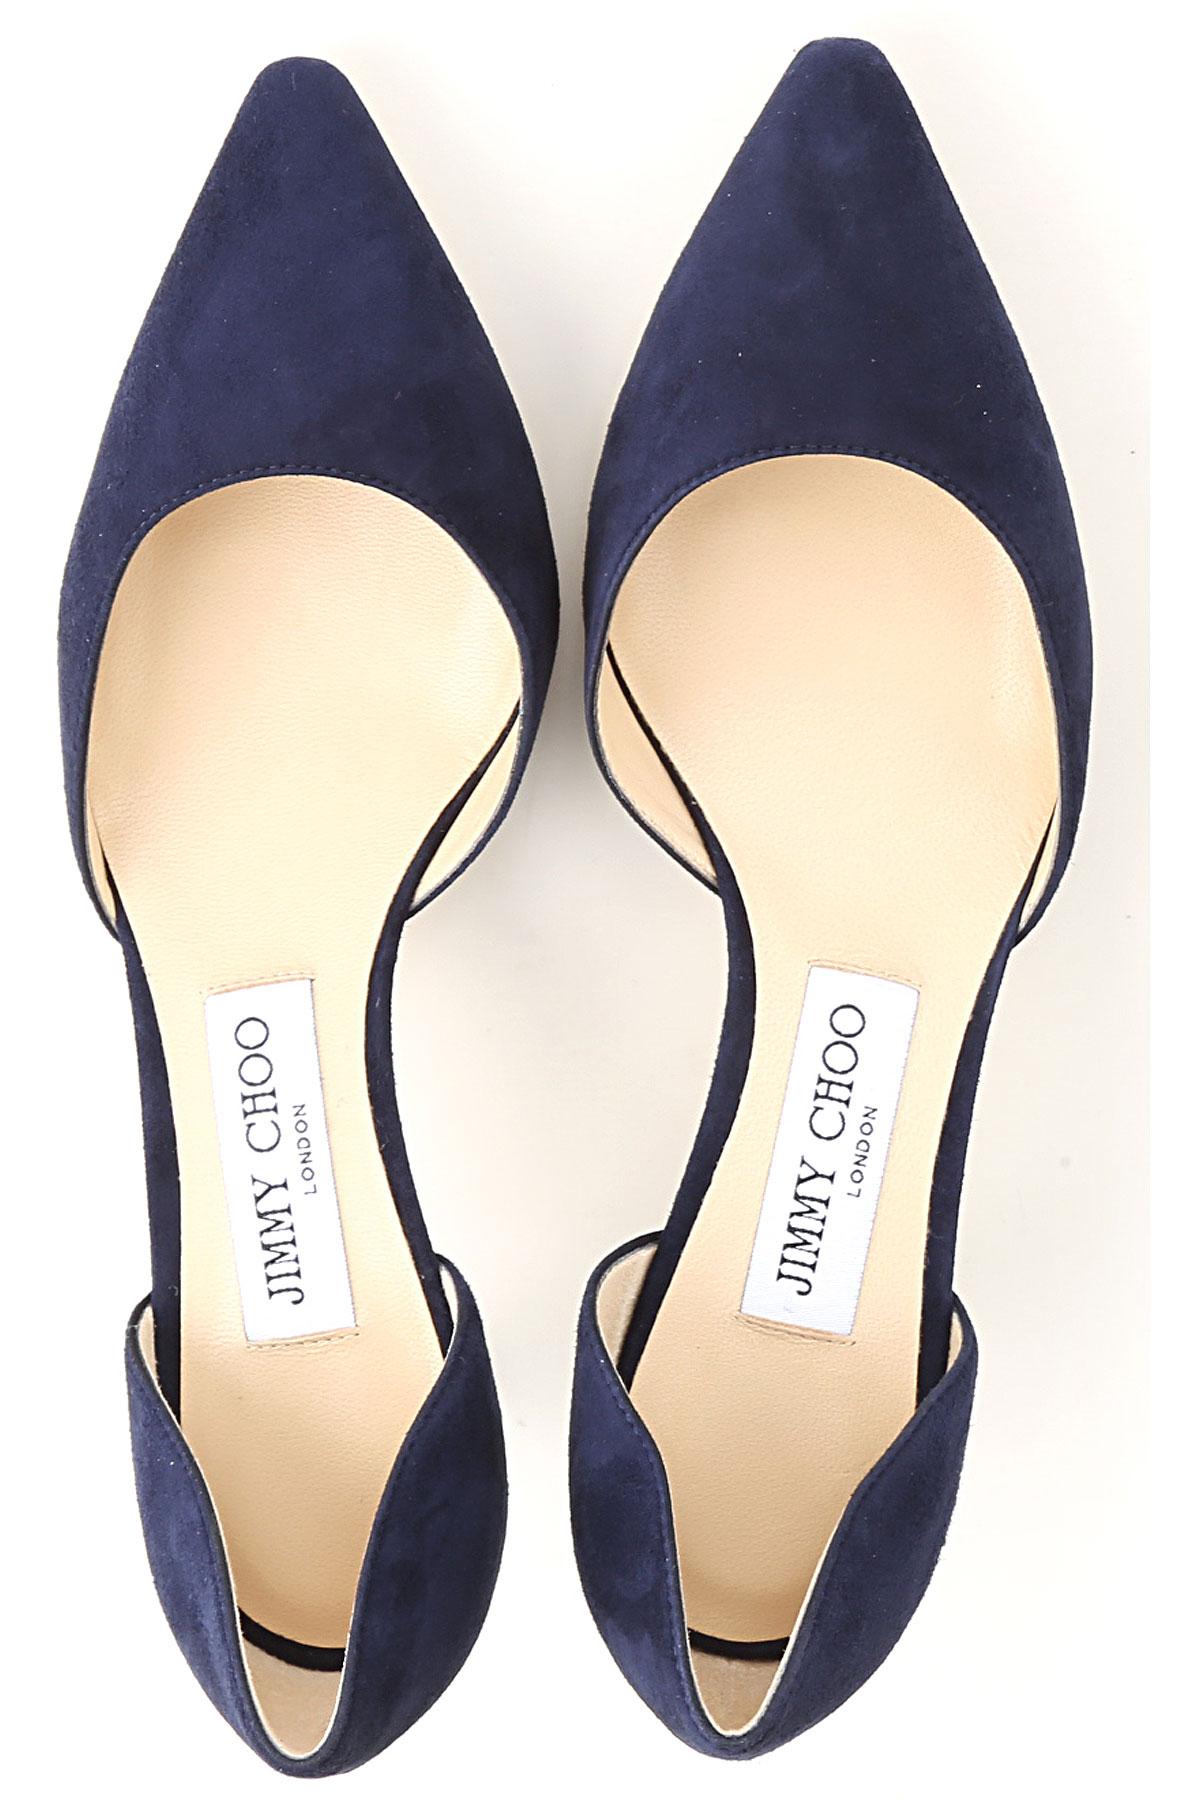 Para Marina verano Jimmy Mujer Choo Primavera nbsp; 2019 Zapatos f6qSwE